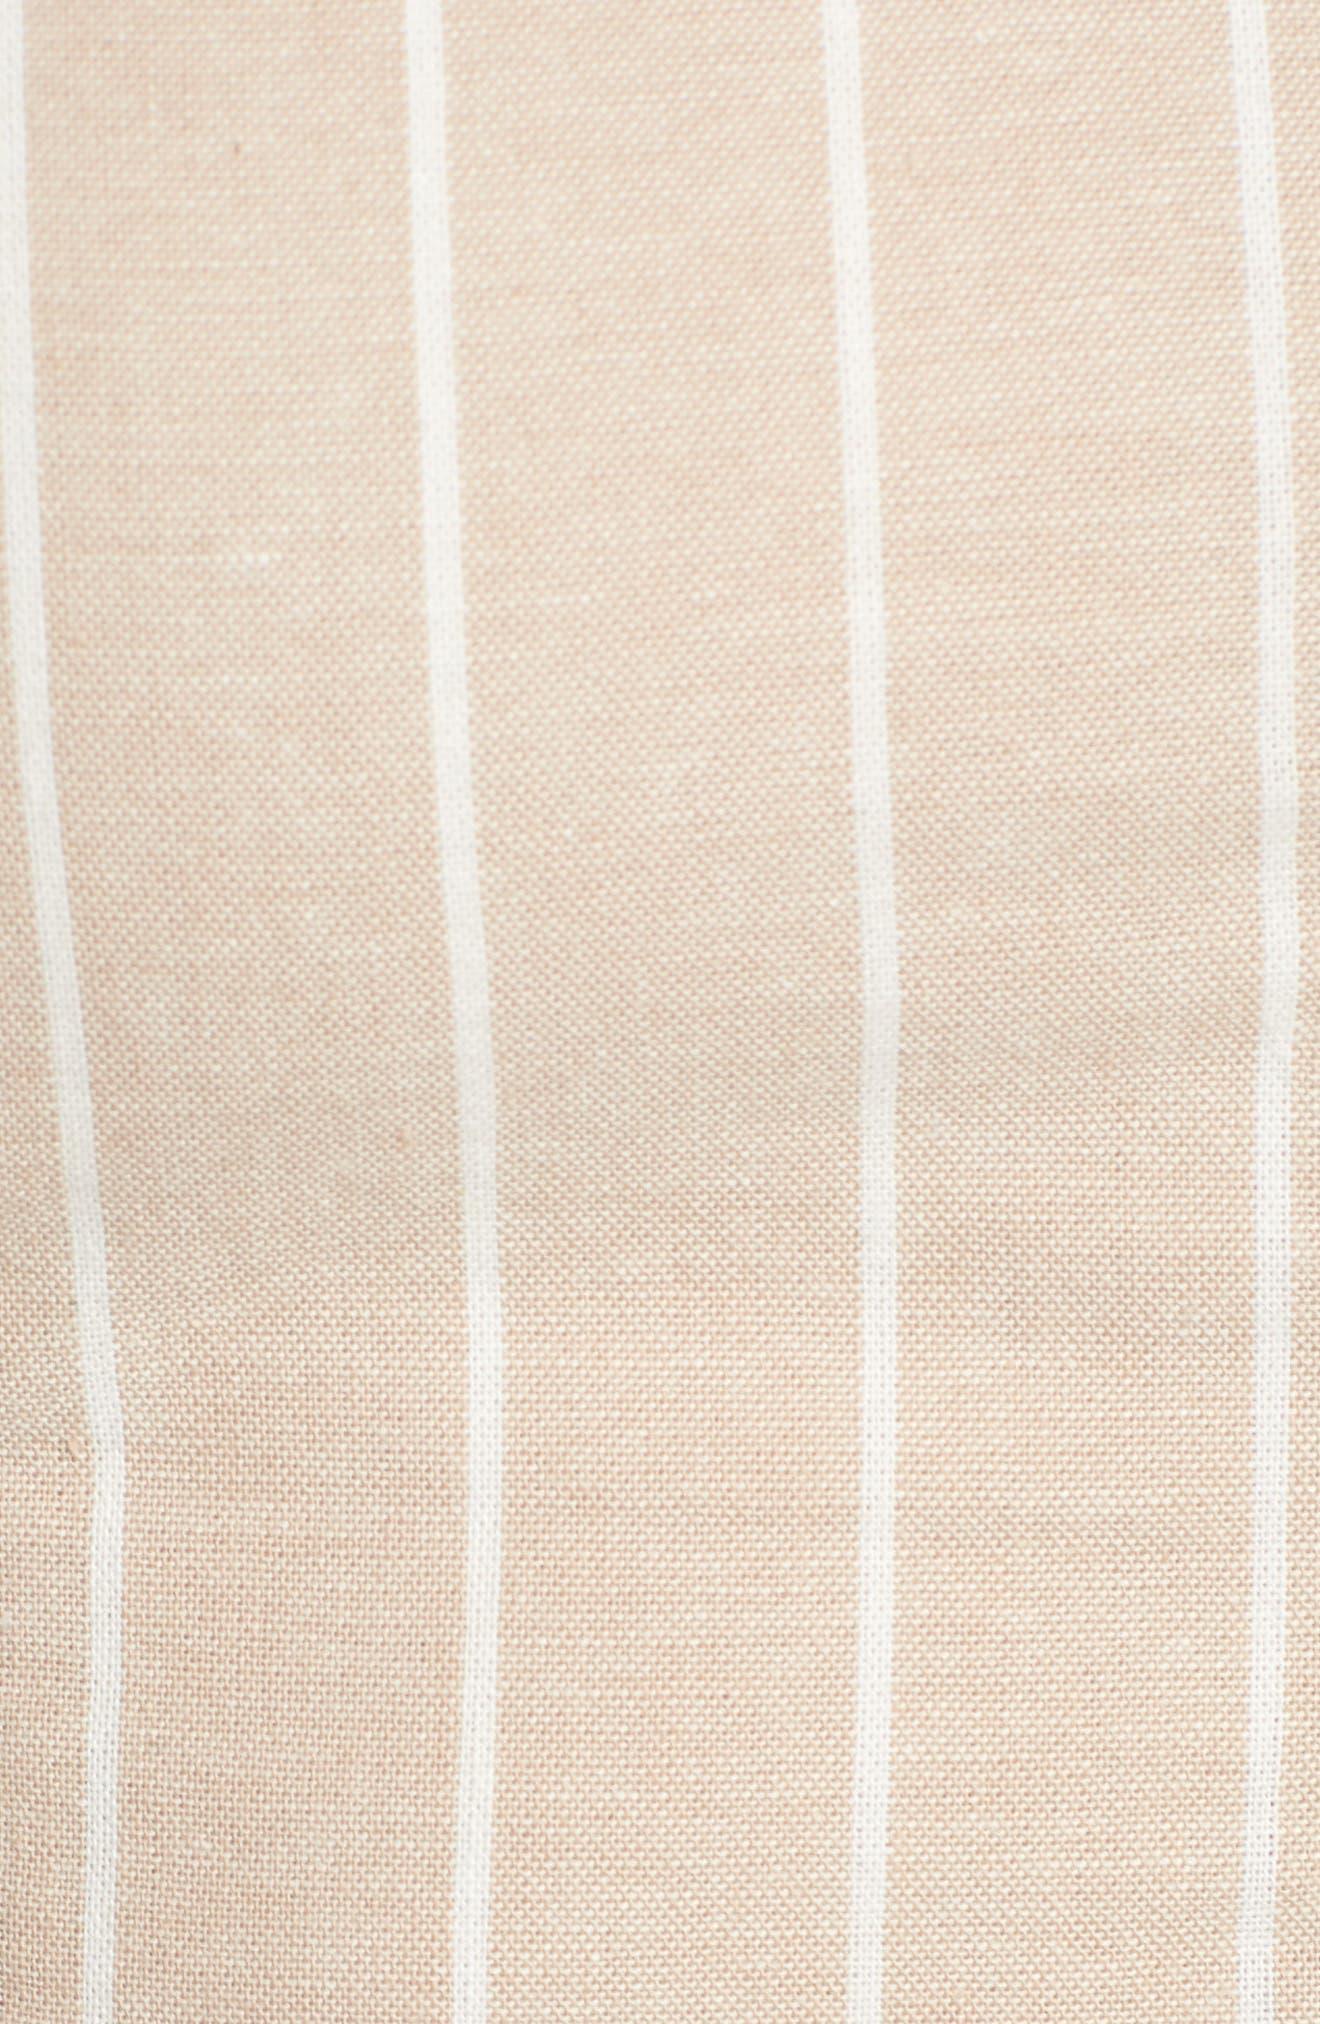 Stripe Crop Top,                             Alternate thumbnail 6, color,                             Beige Morn